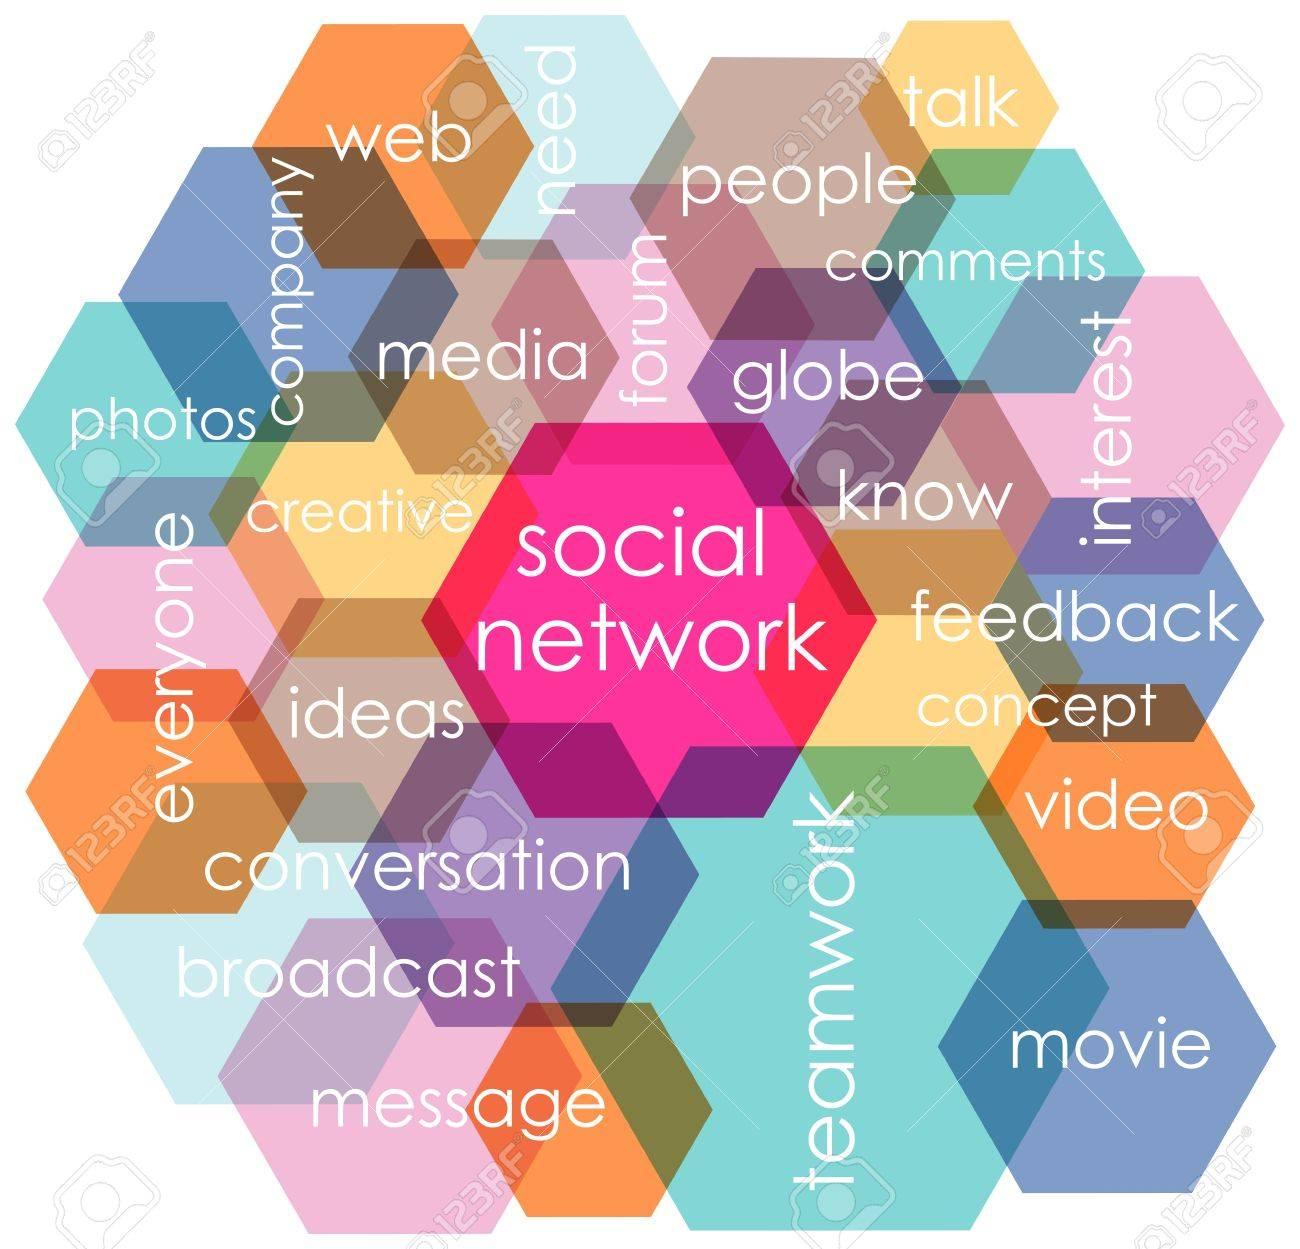 social network concept, vector illustration Stock Vector - 13414885